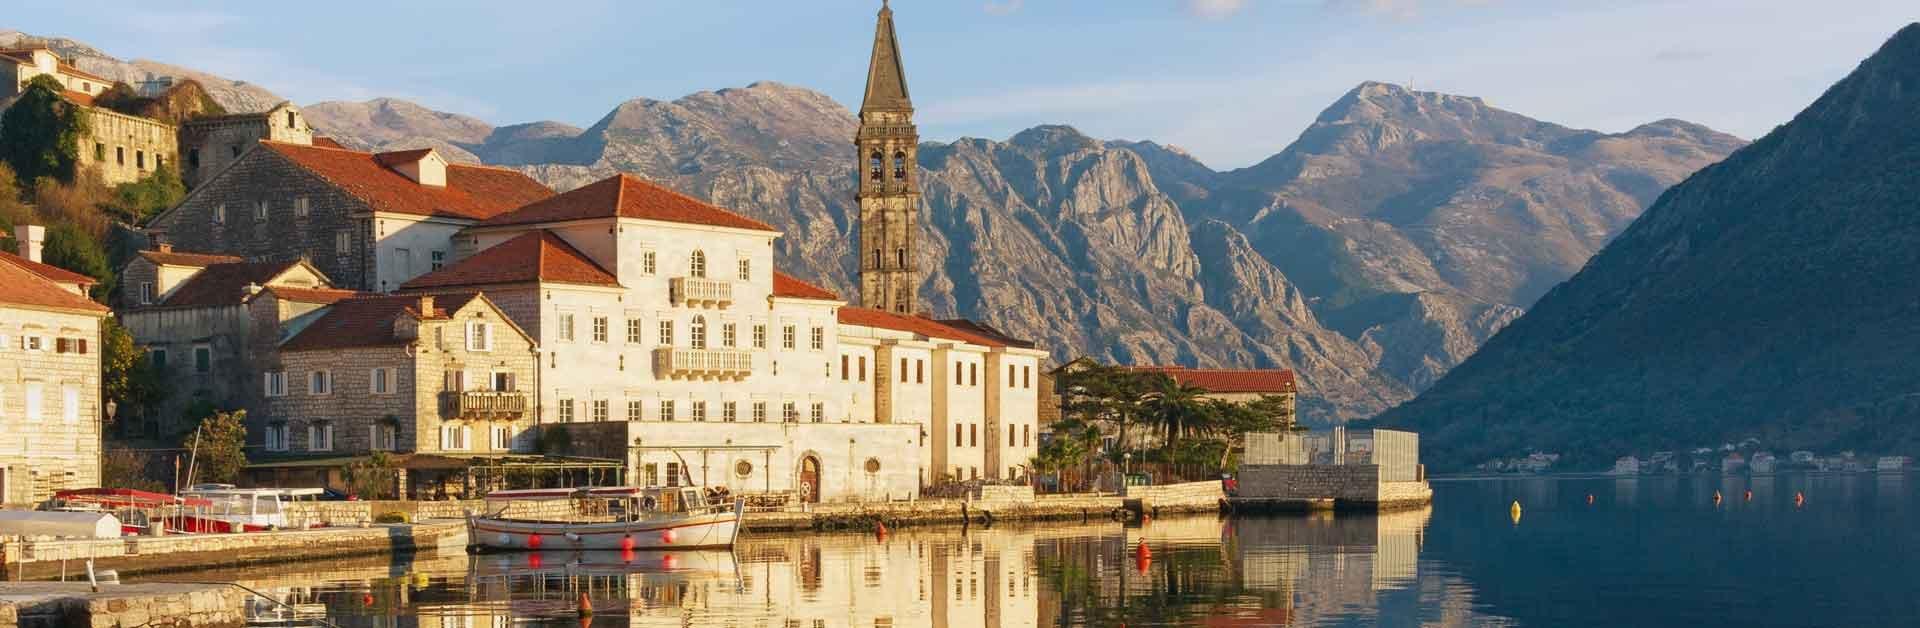 Montenegro waterfront